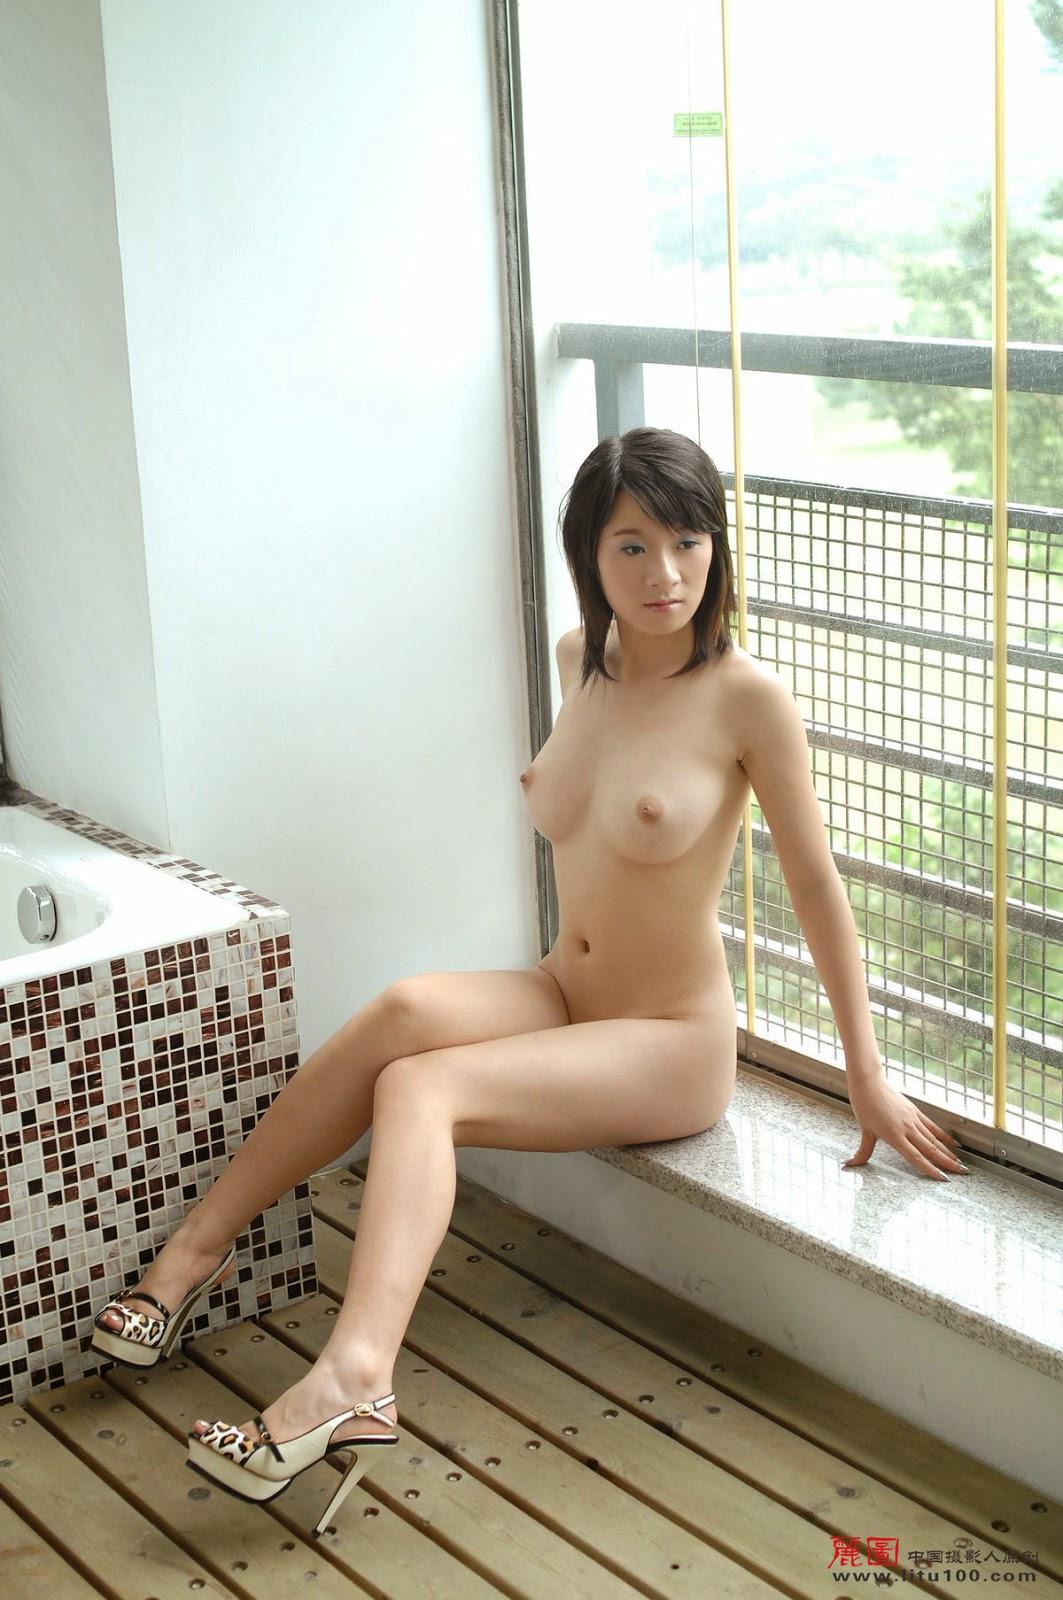 nude girl hard spanking